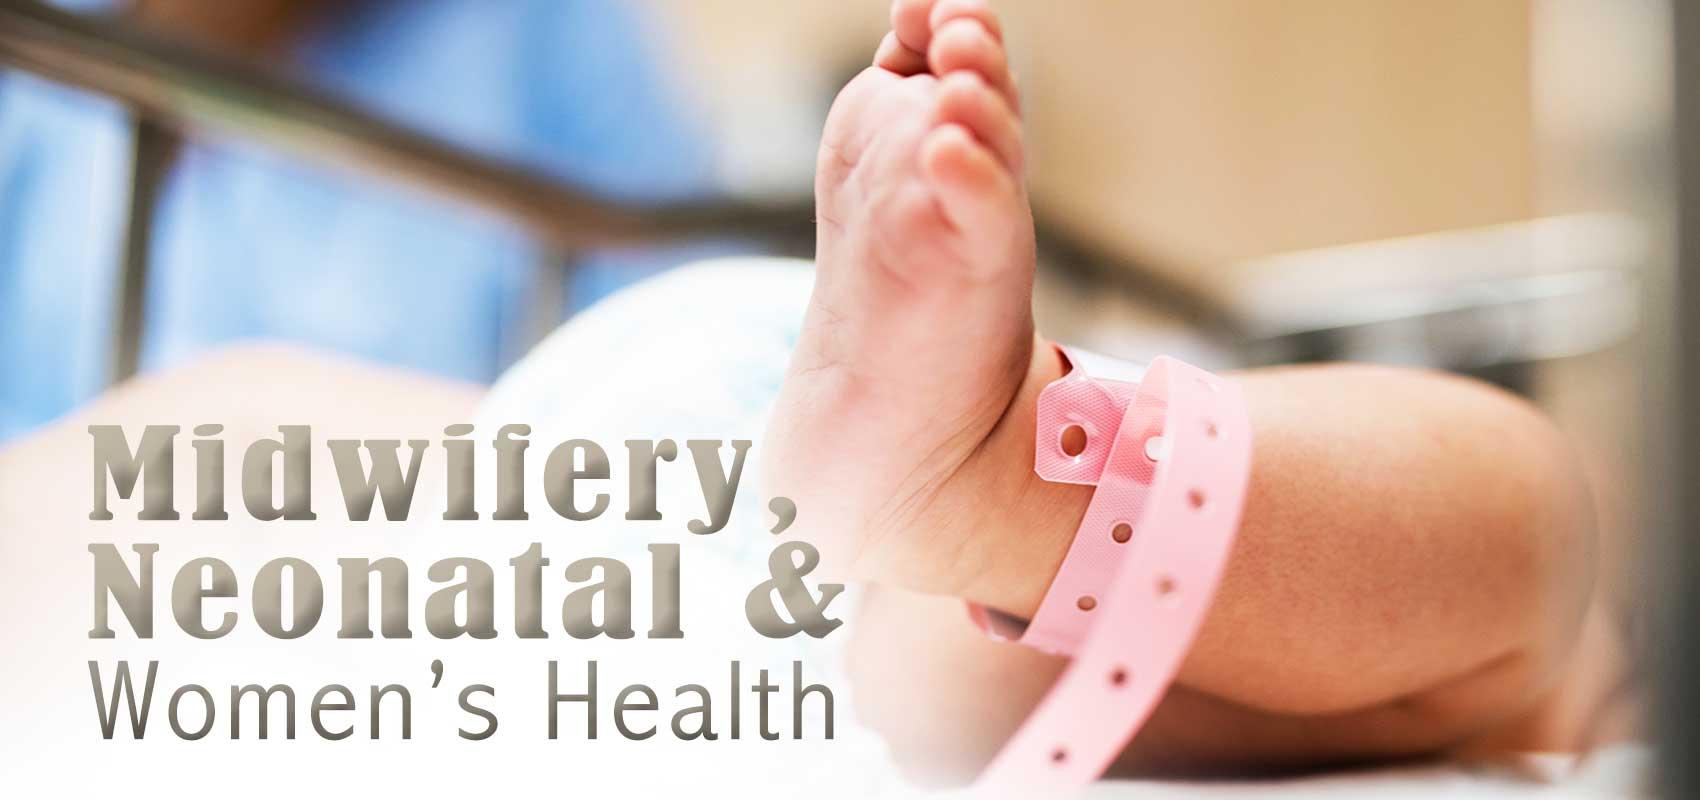 Midwifery, Neonatal and Women's Health